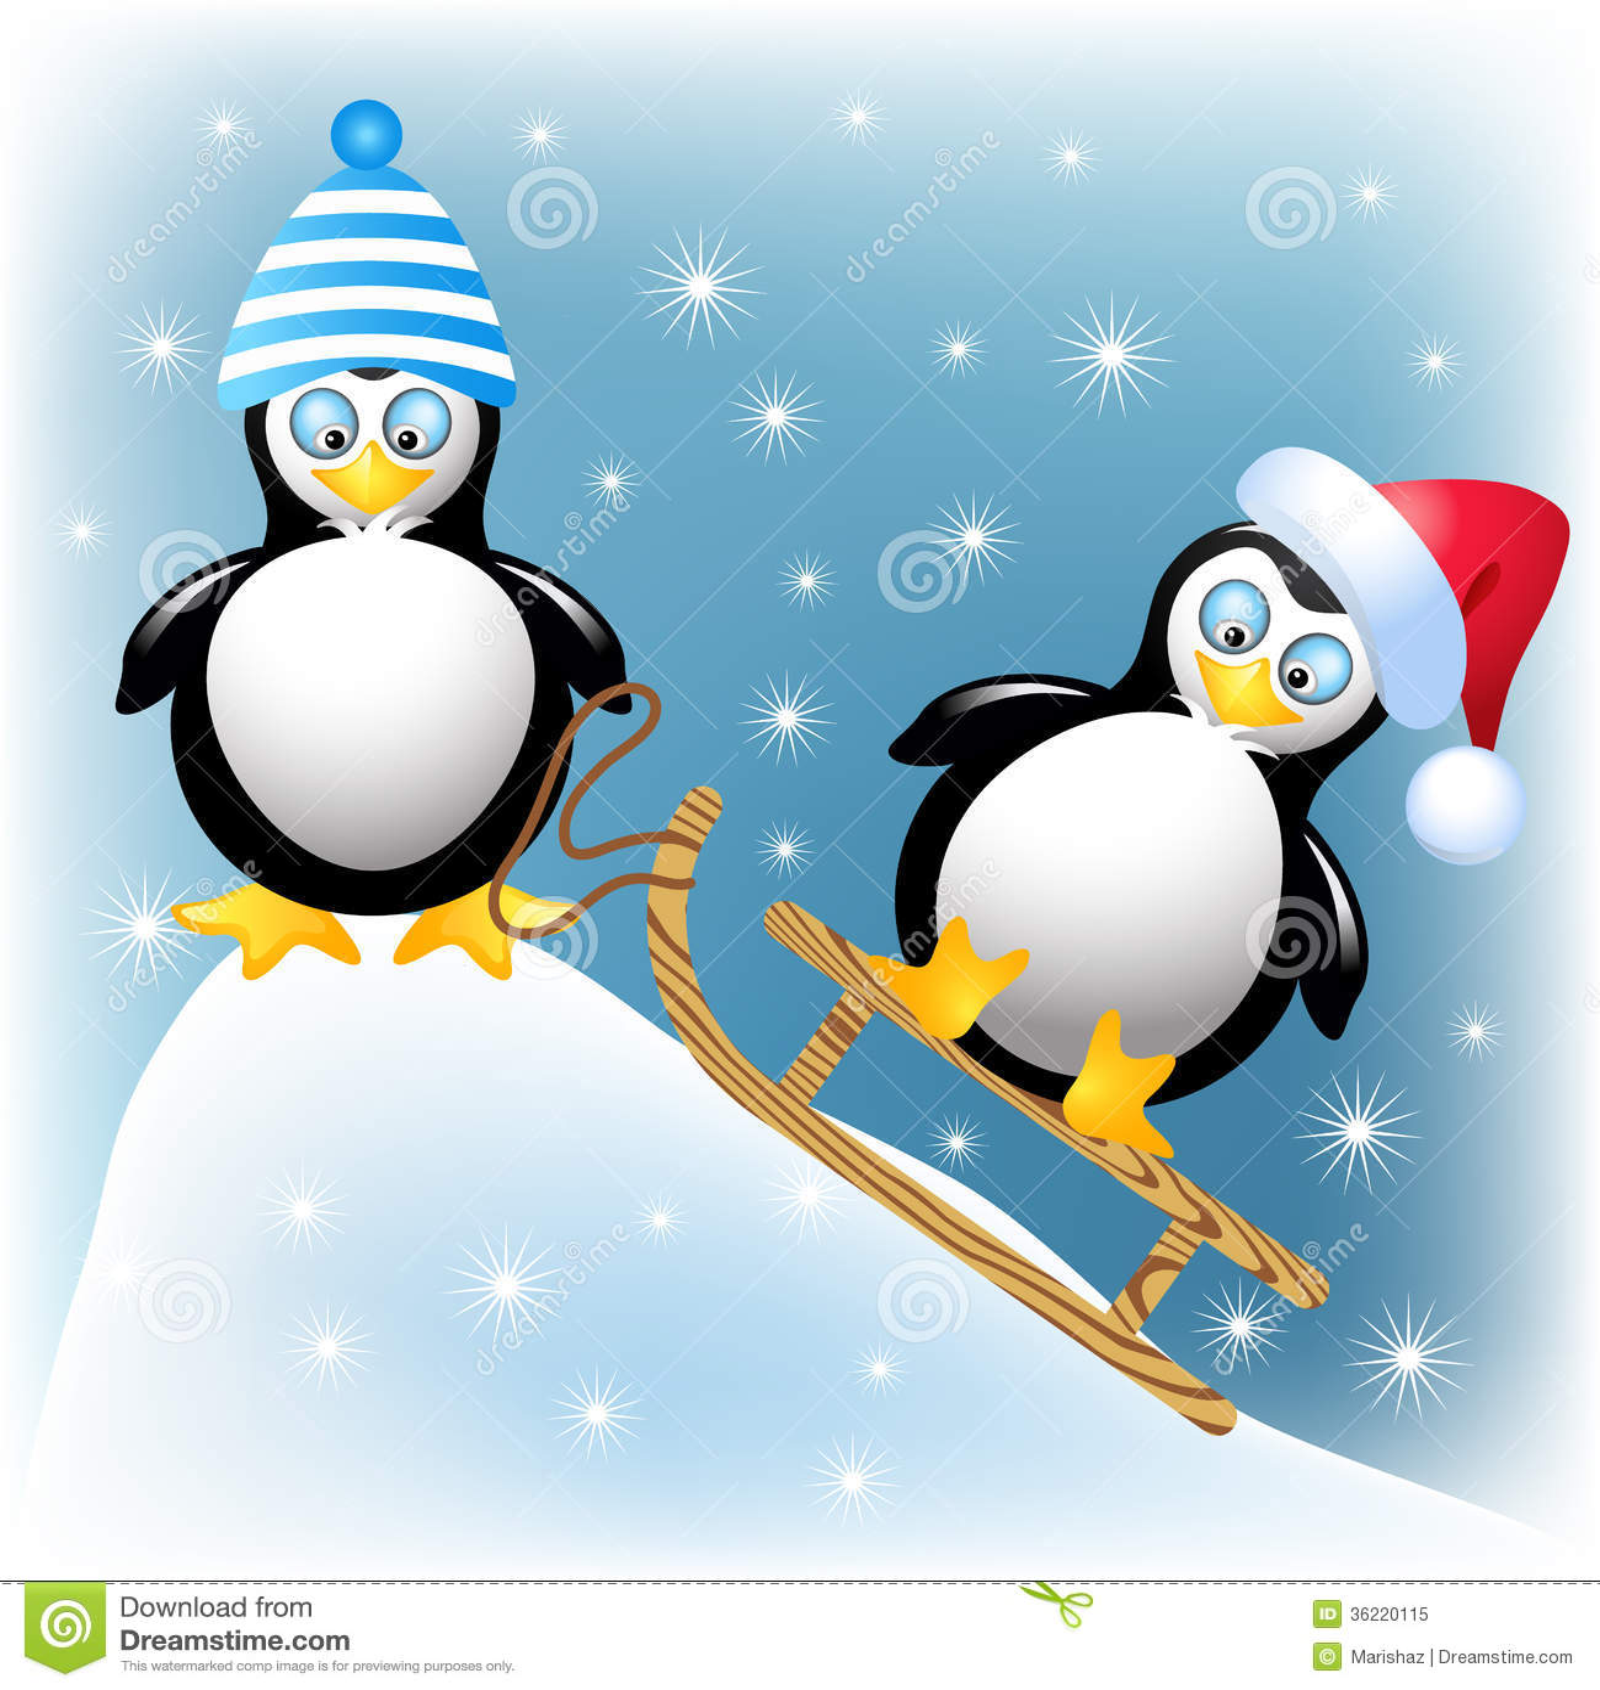 funny penguins royalty free stock photo image 36220115